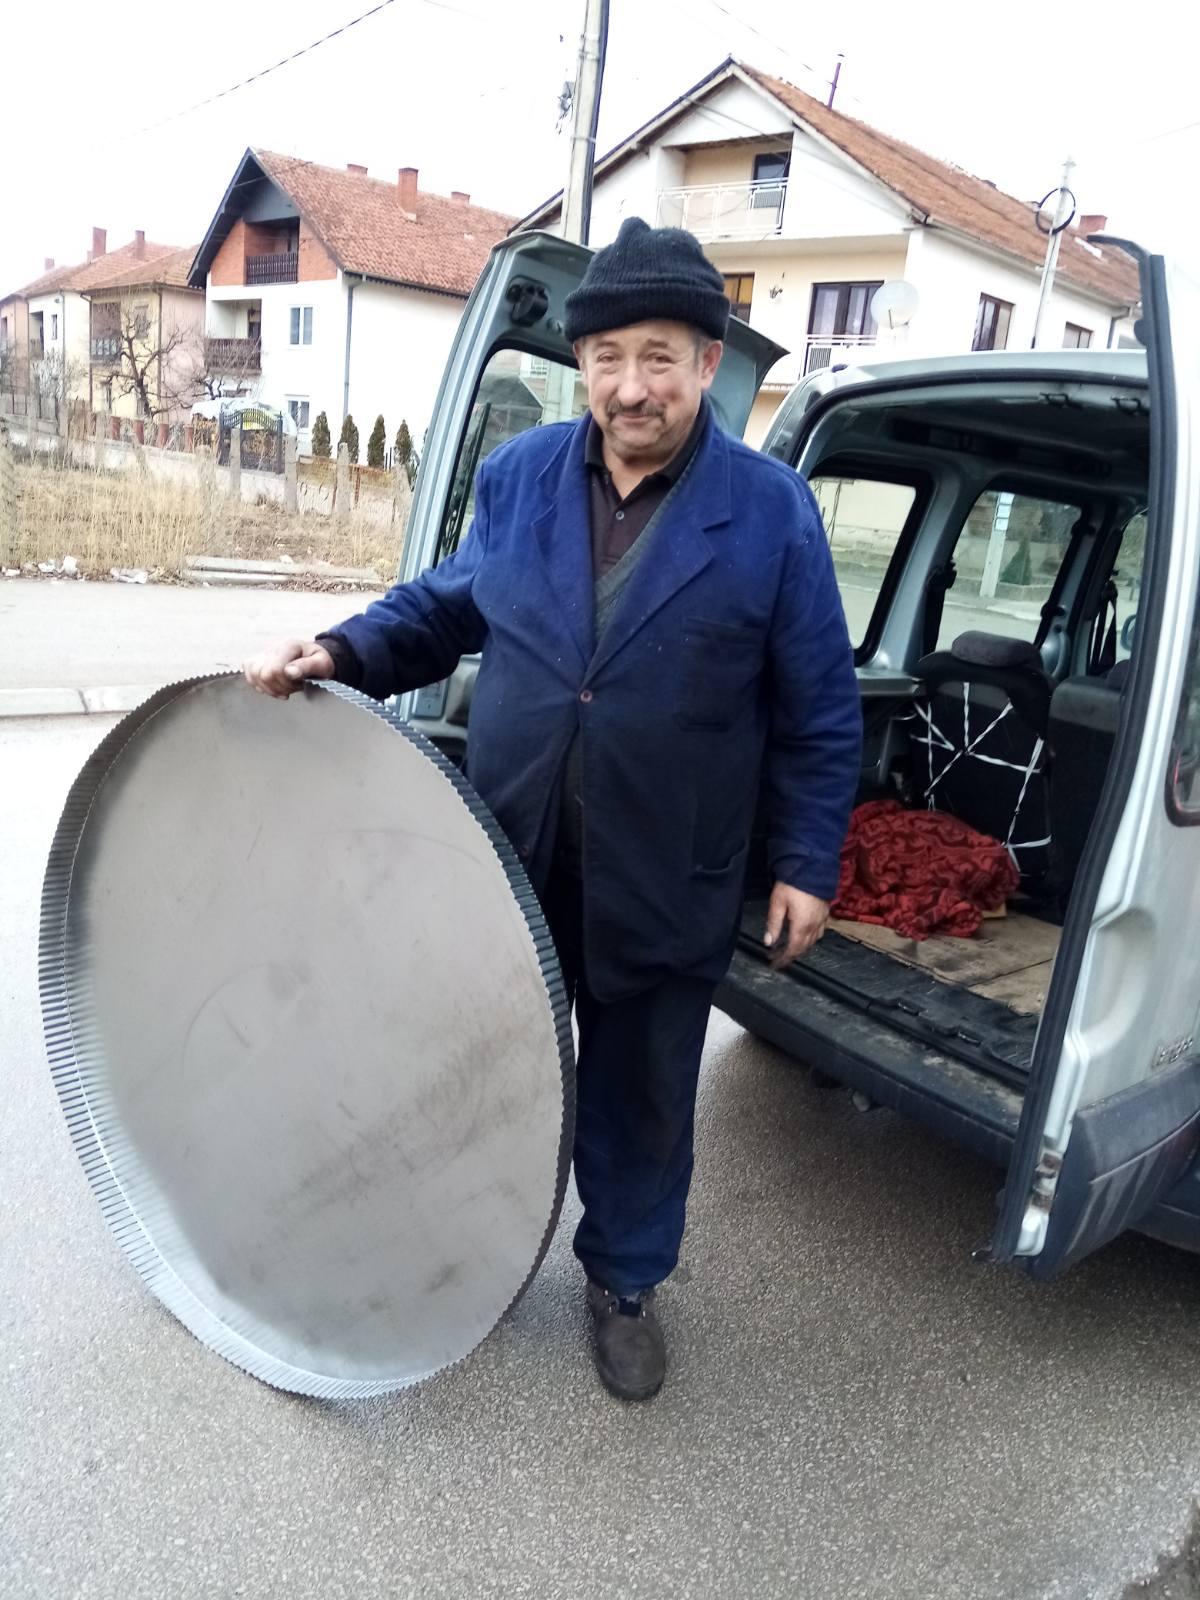 Mile Pavlović Kazandžija, foto: L.T.